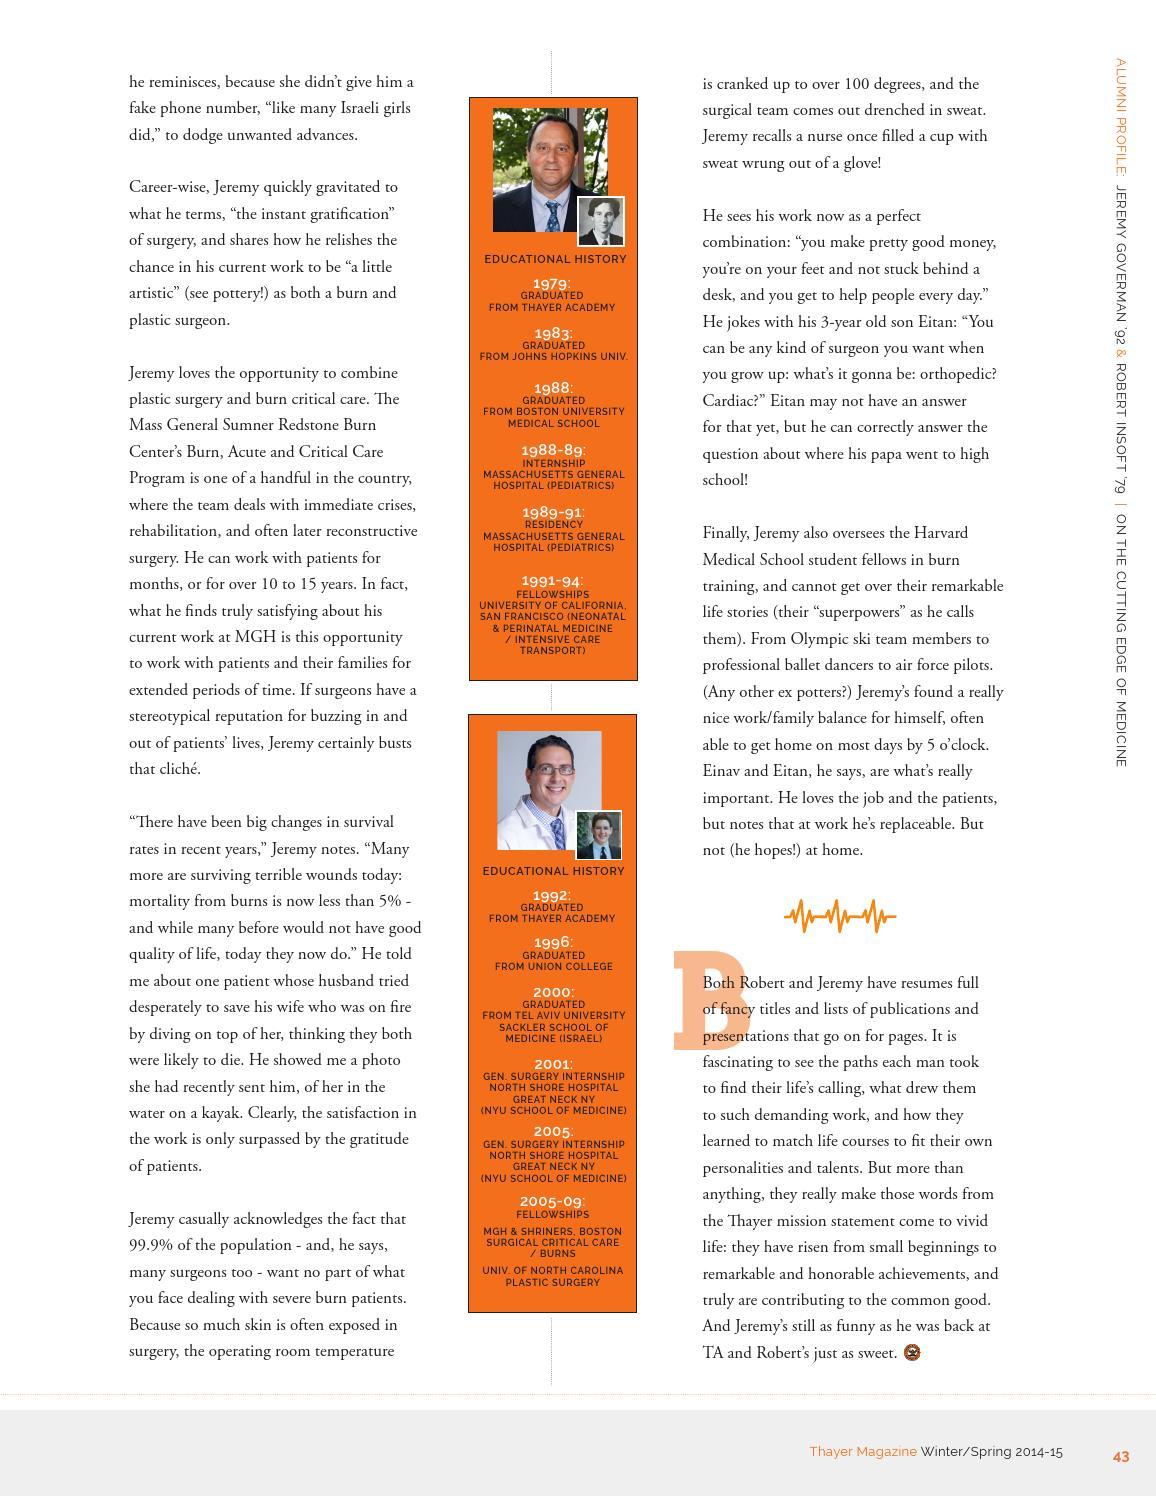 Thayer Magazine - Winter/Spring 2014-15 by Thayer Academy